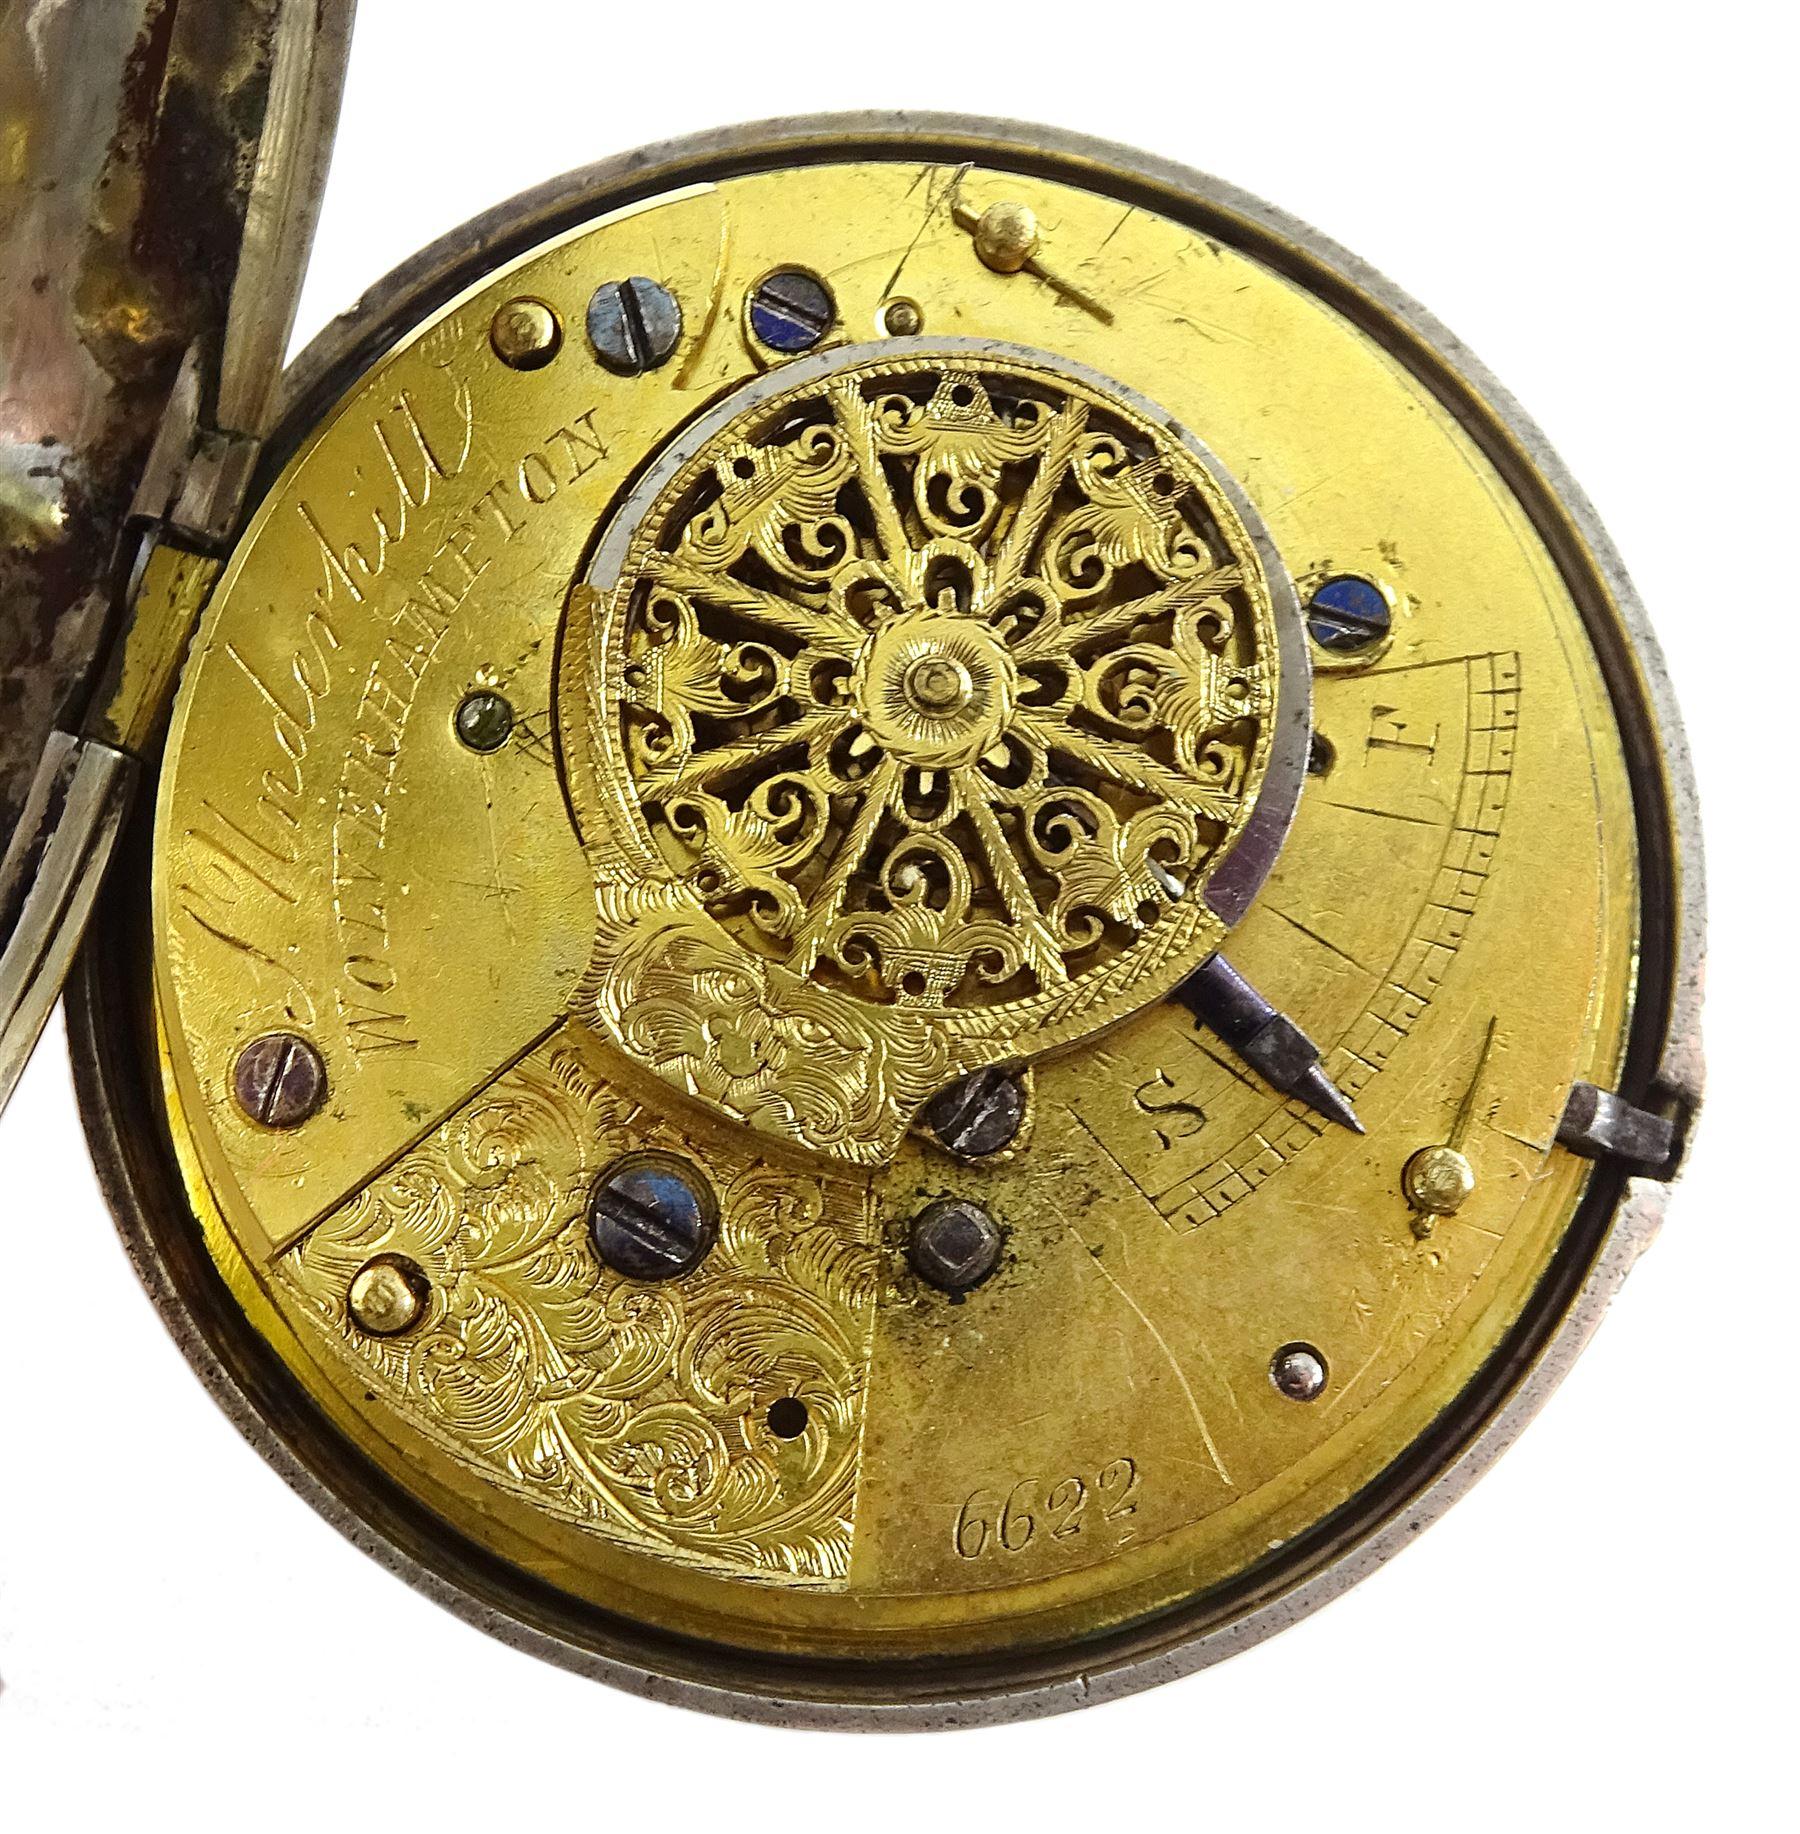 William IV silver half hunter verge fusee pocket watch by Samuel Underwood, Wolverhampton, No. 6622, - Image 4 of 6